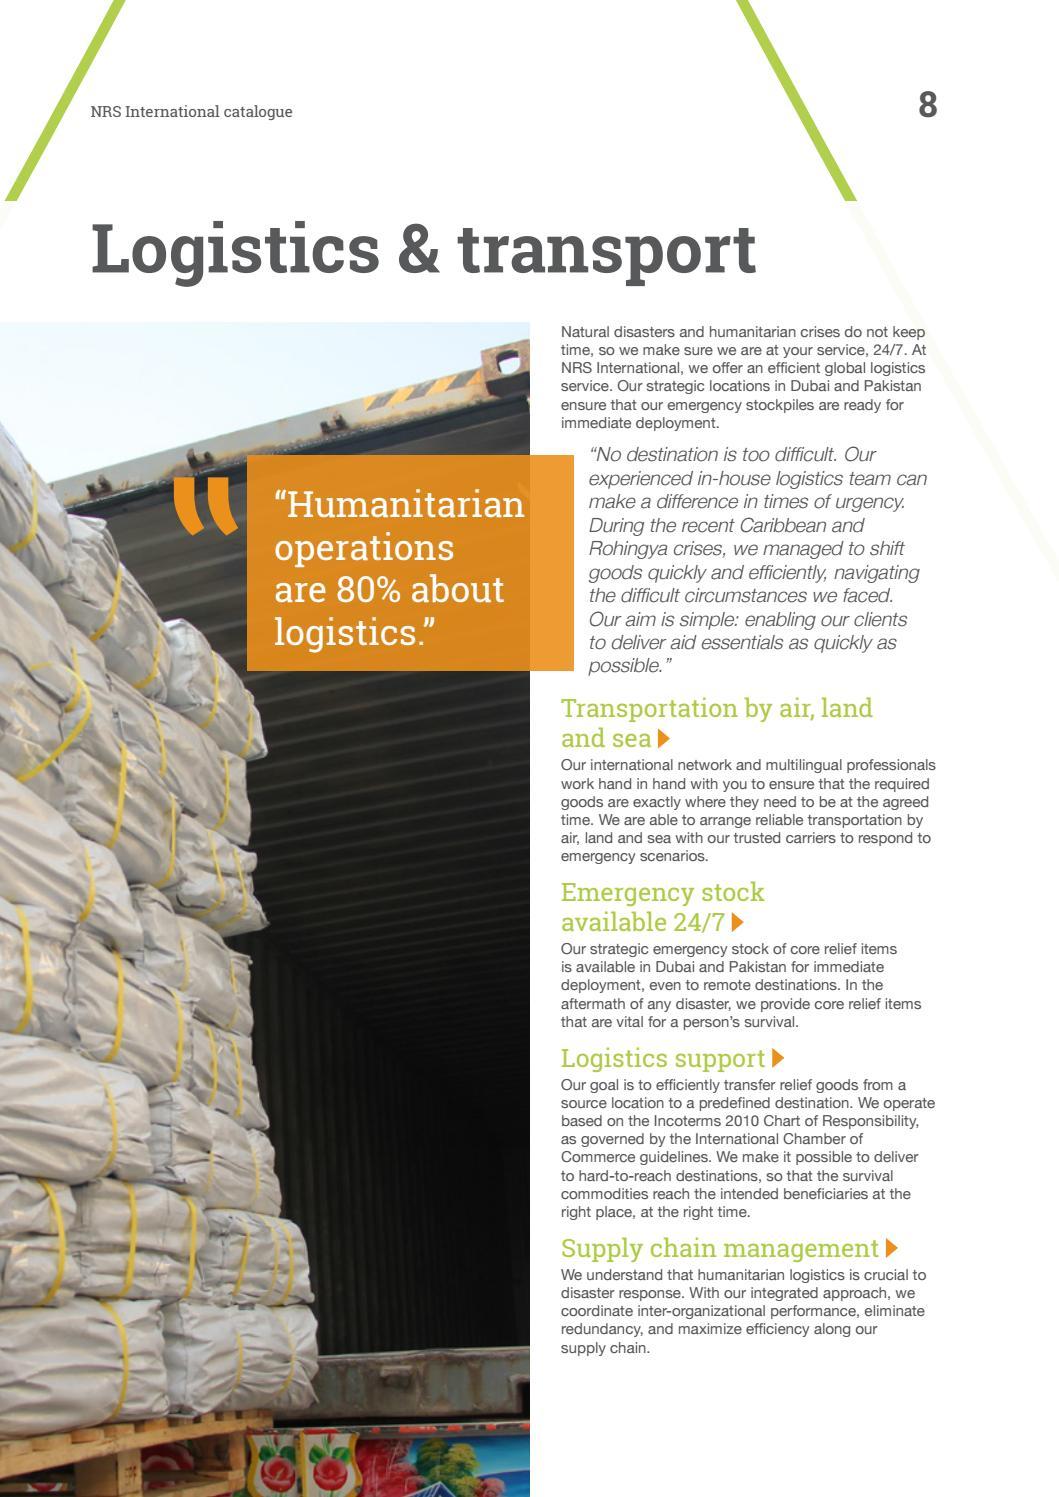 NRS International Integrated Catalogue 2018